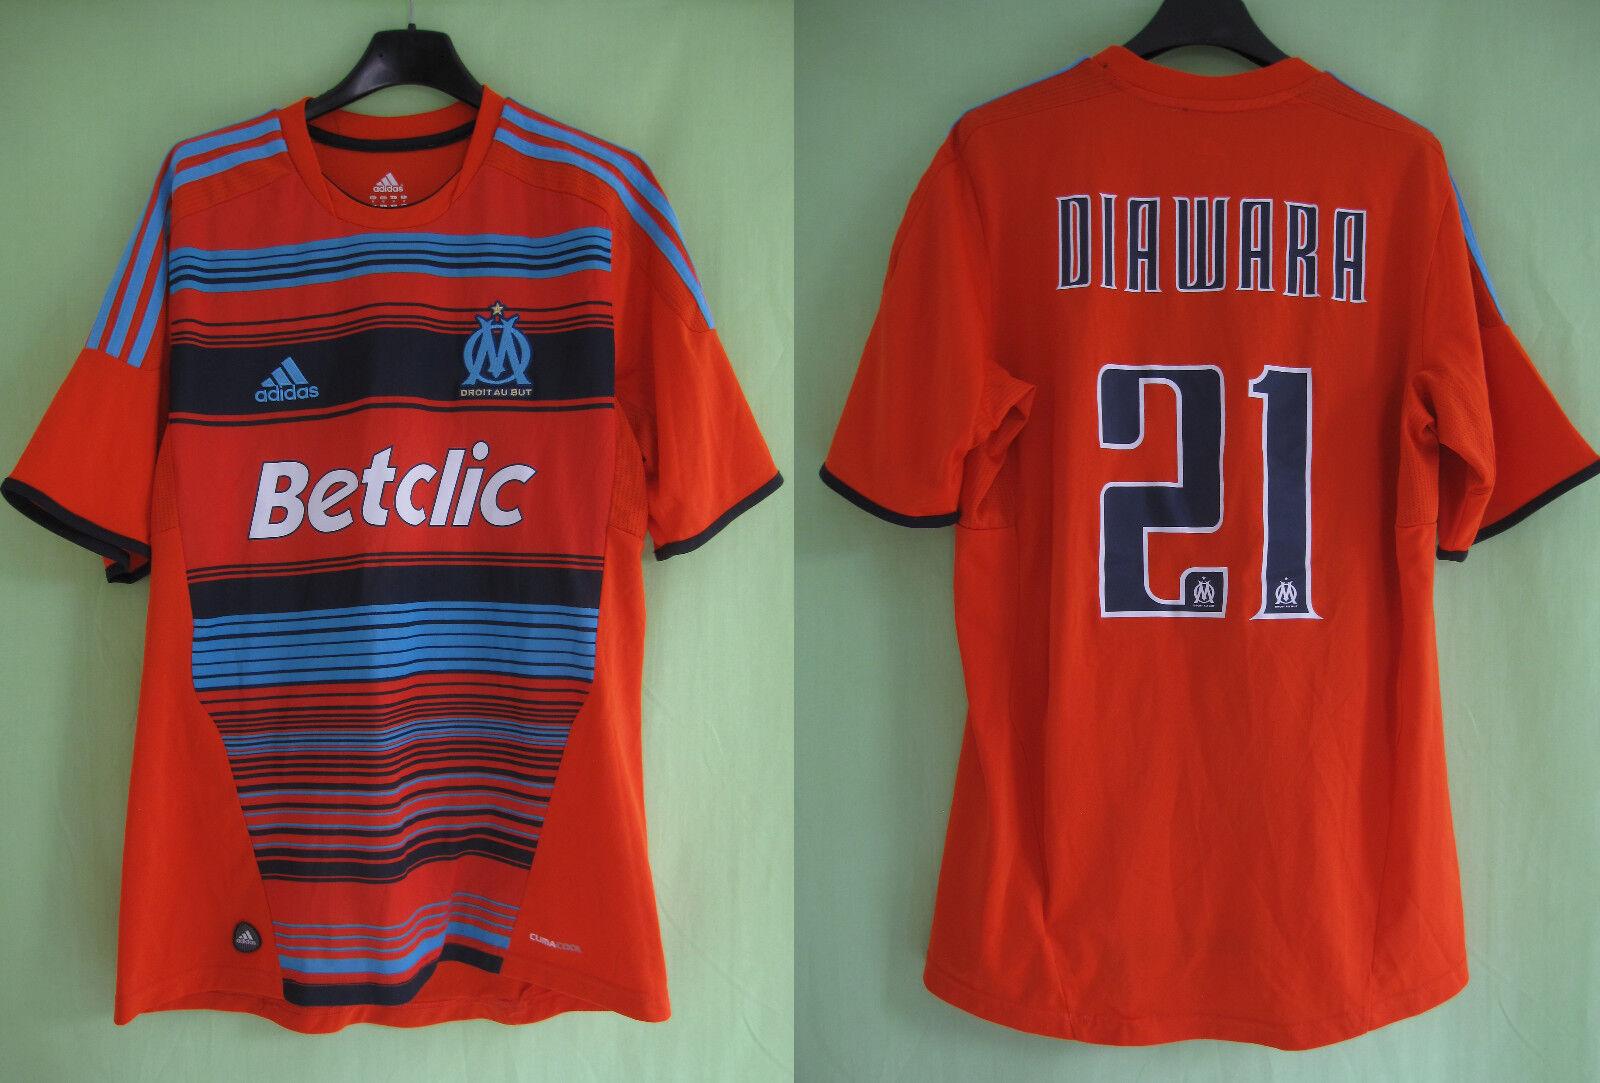 Maillot Olympique Marseille 2011 Third shirt DIAWARA  21 OM Betclic Vintage  M